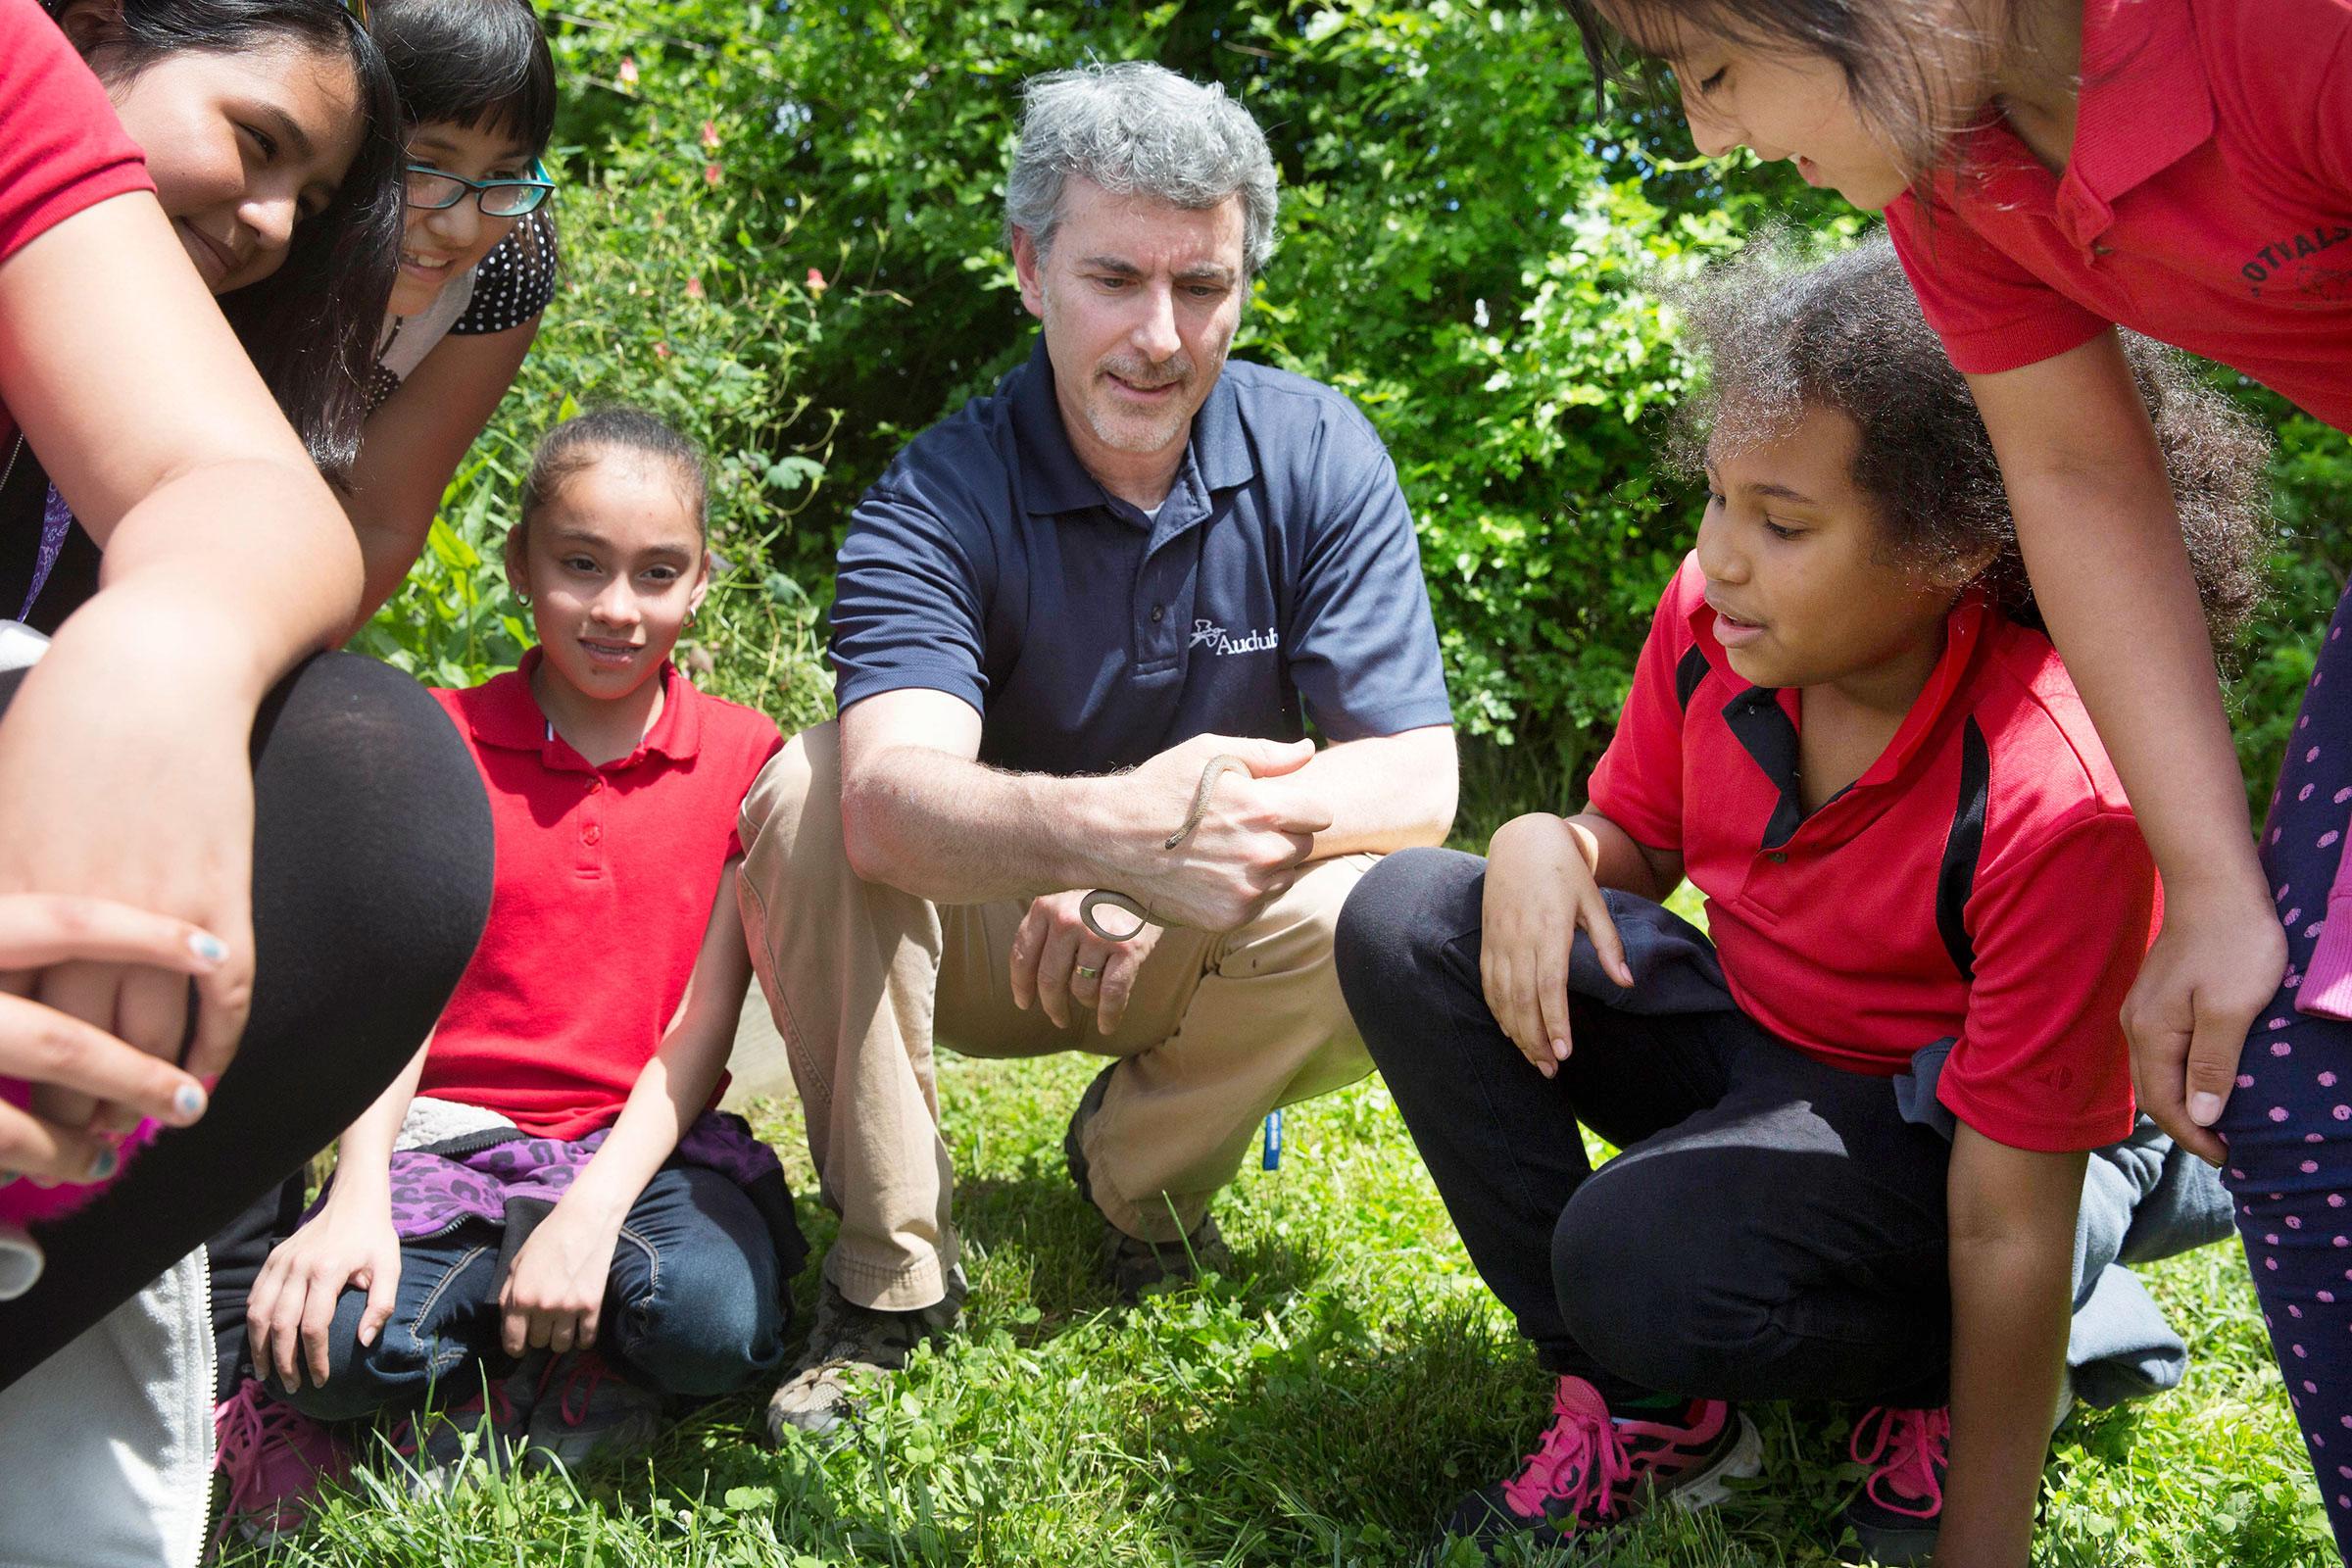 Steve Saffier, former Network Engagement Manager at Audubon Pennsylvania, shows off a garter snake during a science class at Gotwals Elementary School in Norristown. Rachel Wisniewski